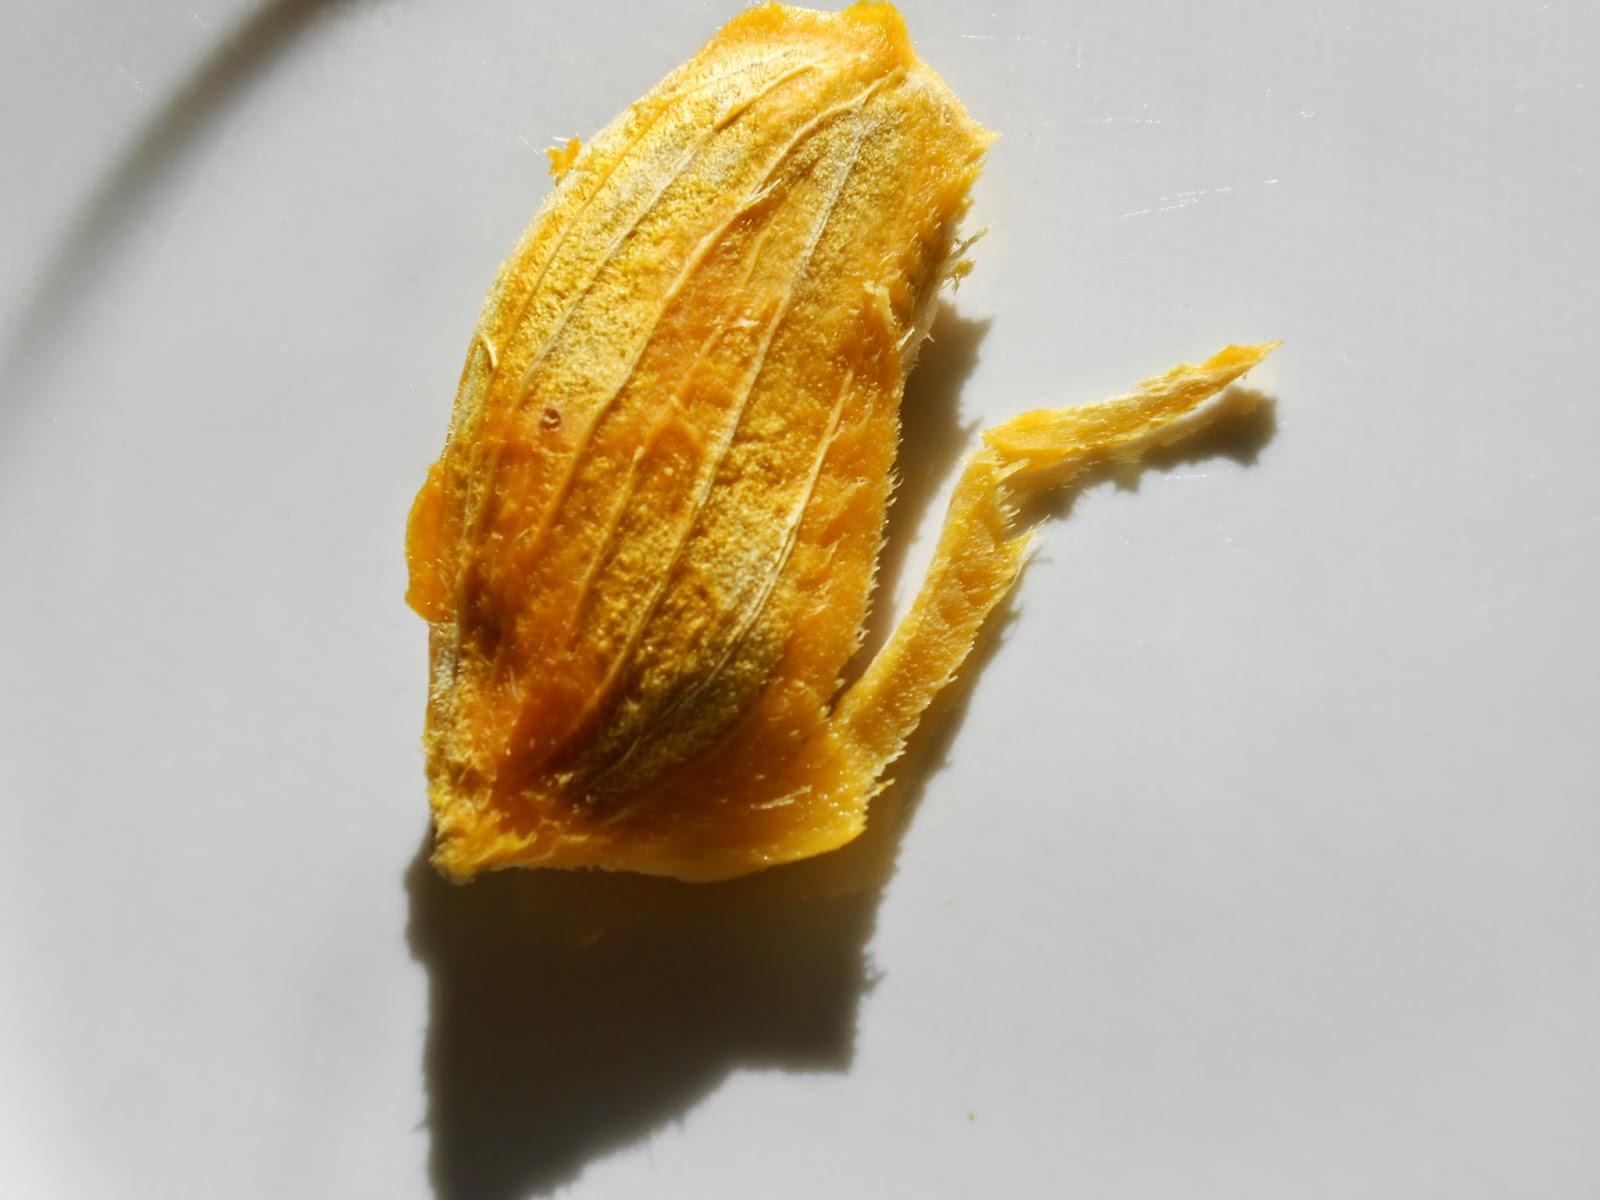 Regrow 8 Kitchen Scraps into Free Houseplants! - A Piece ...  |Mango Seed Inside